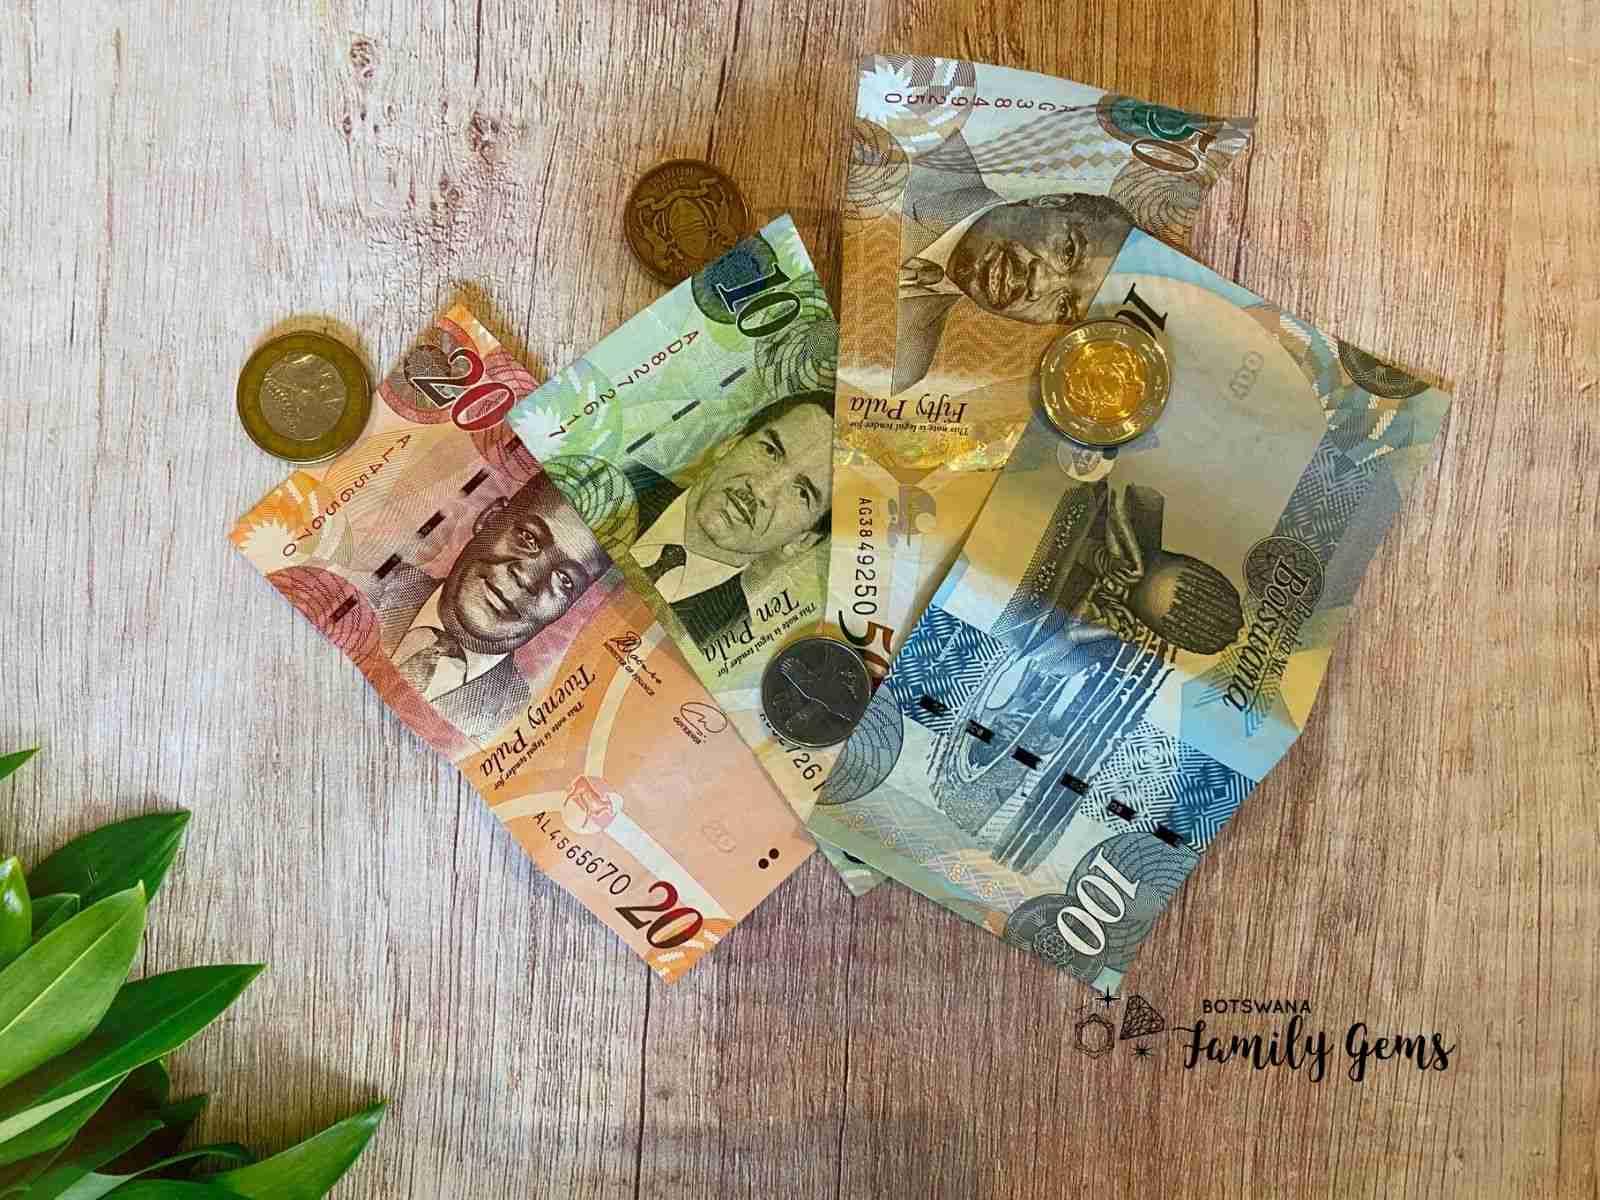 financial goal setting in Botswana